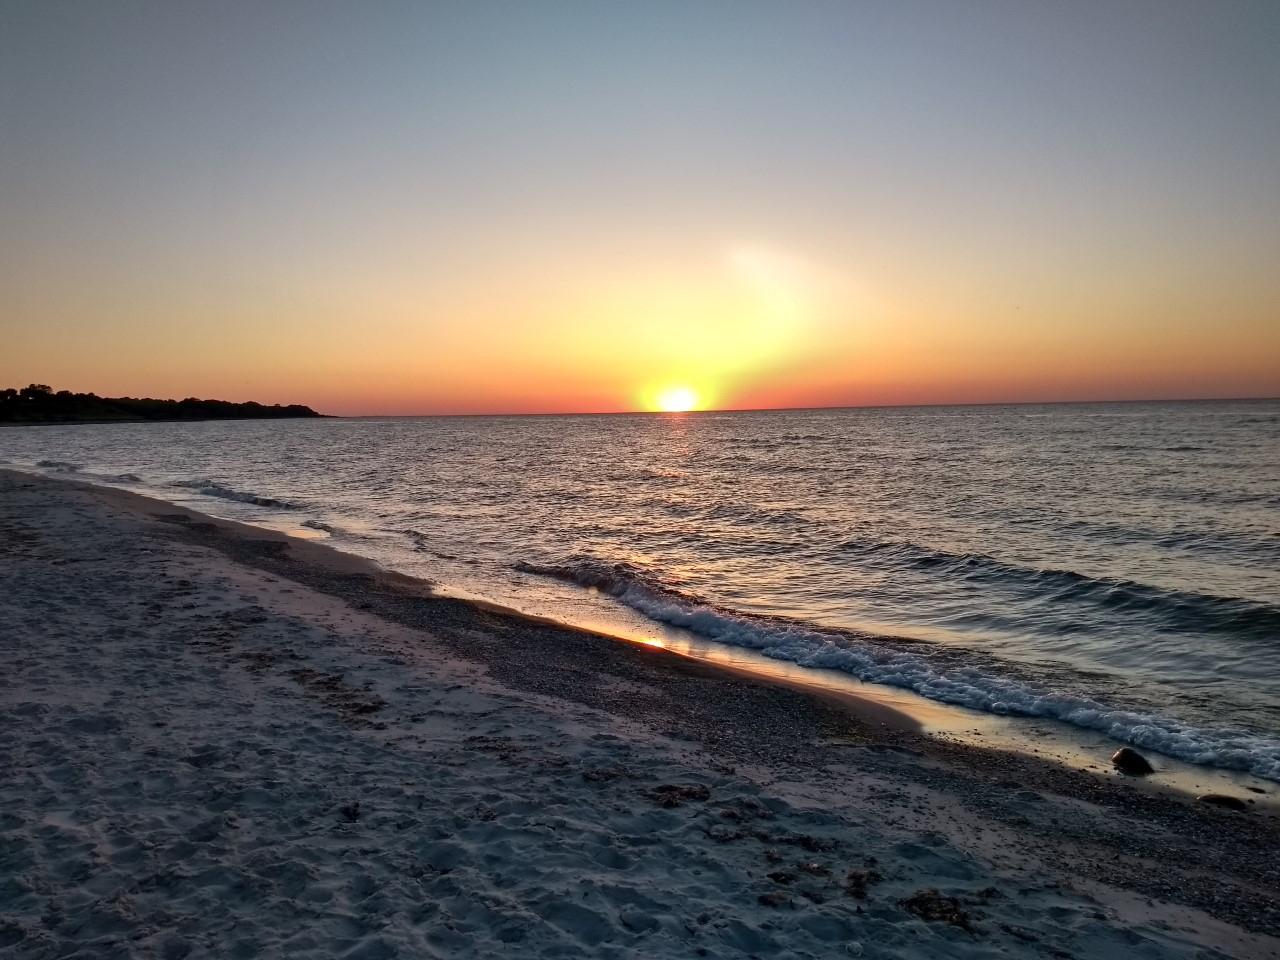 Solnedgang ved Lumsås copy.jpg